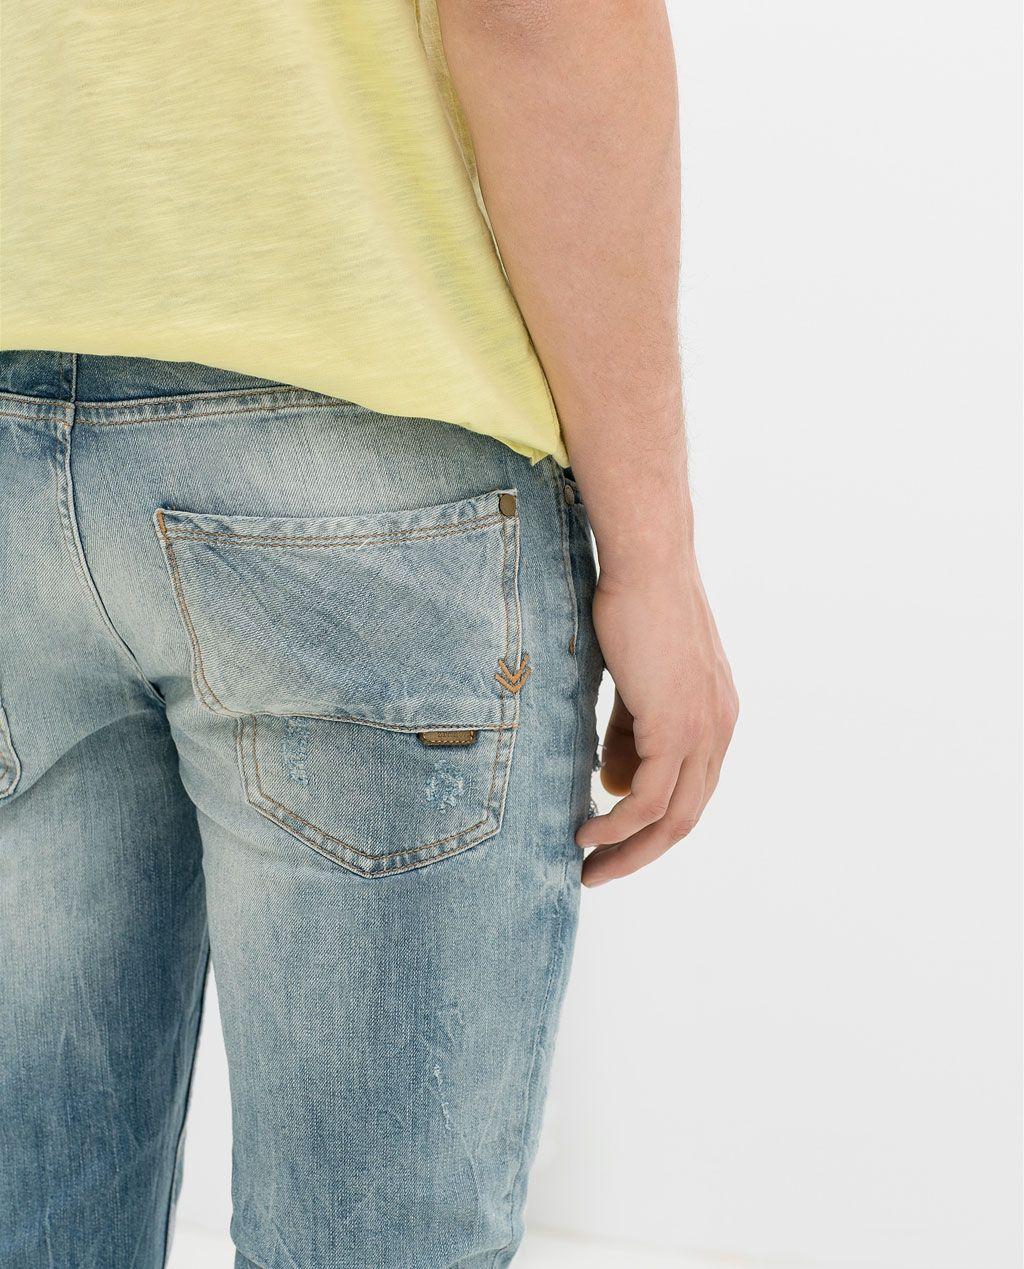 Back Pocket Denim Research Details Wash Pinterest Pantalon